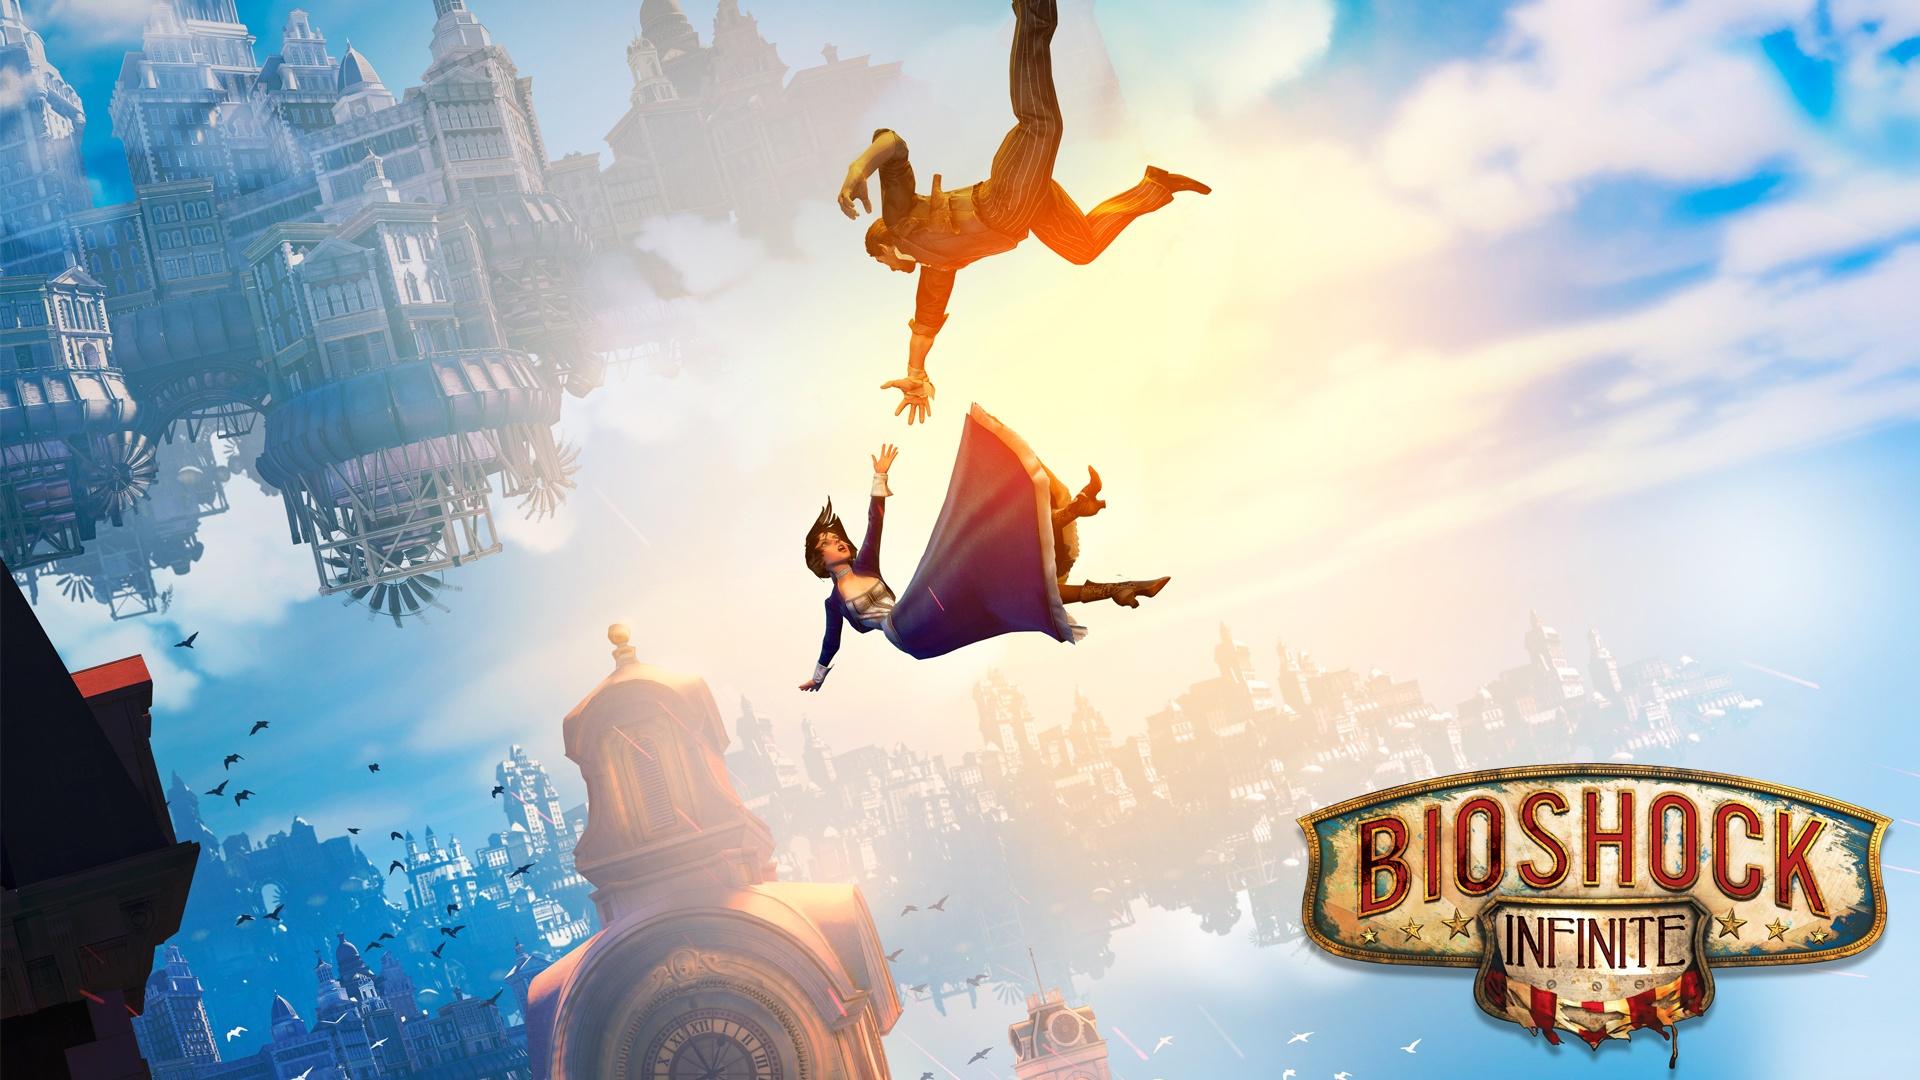 bioshock-infinite-game-wallpaper.jpg - -